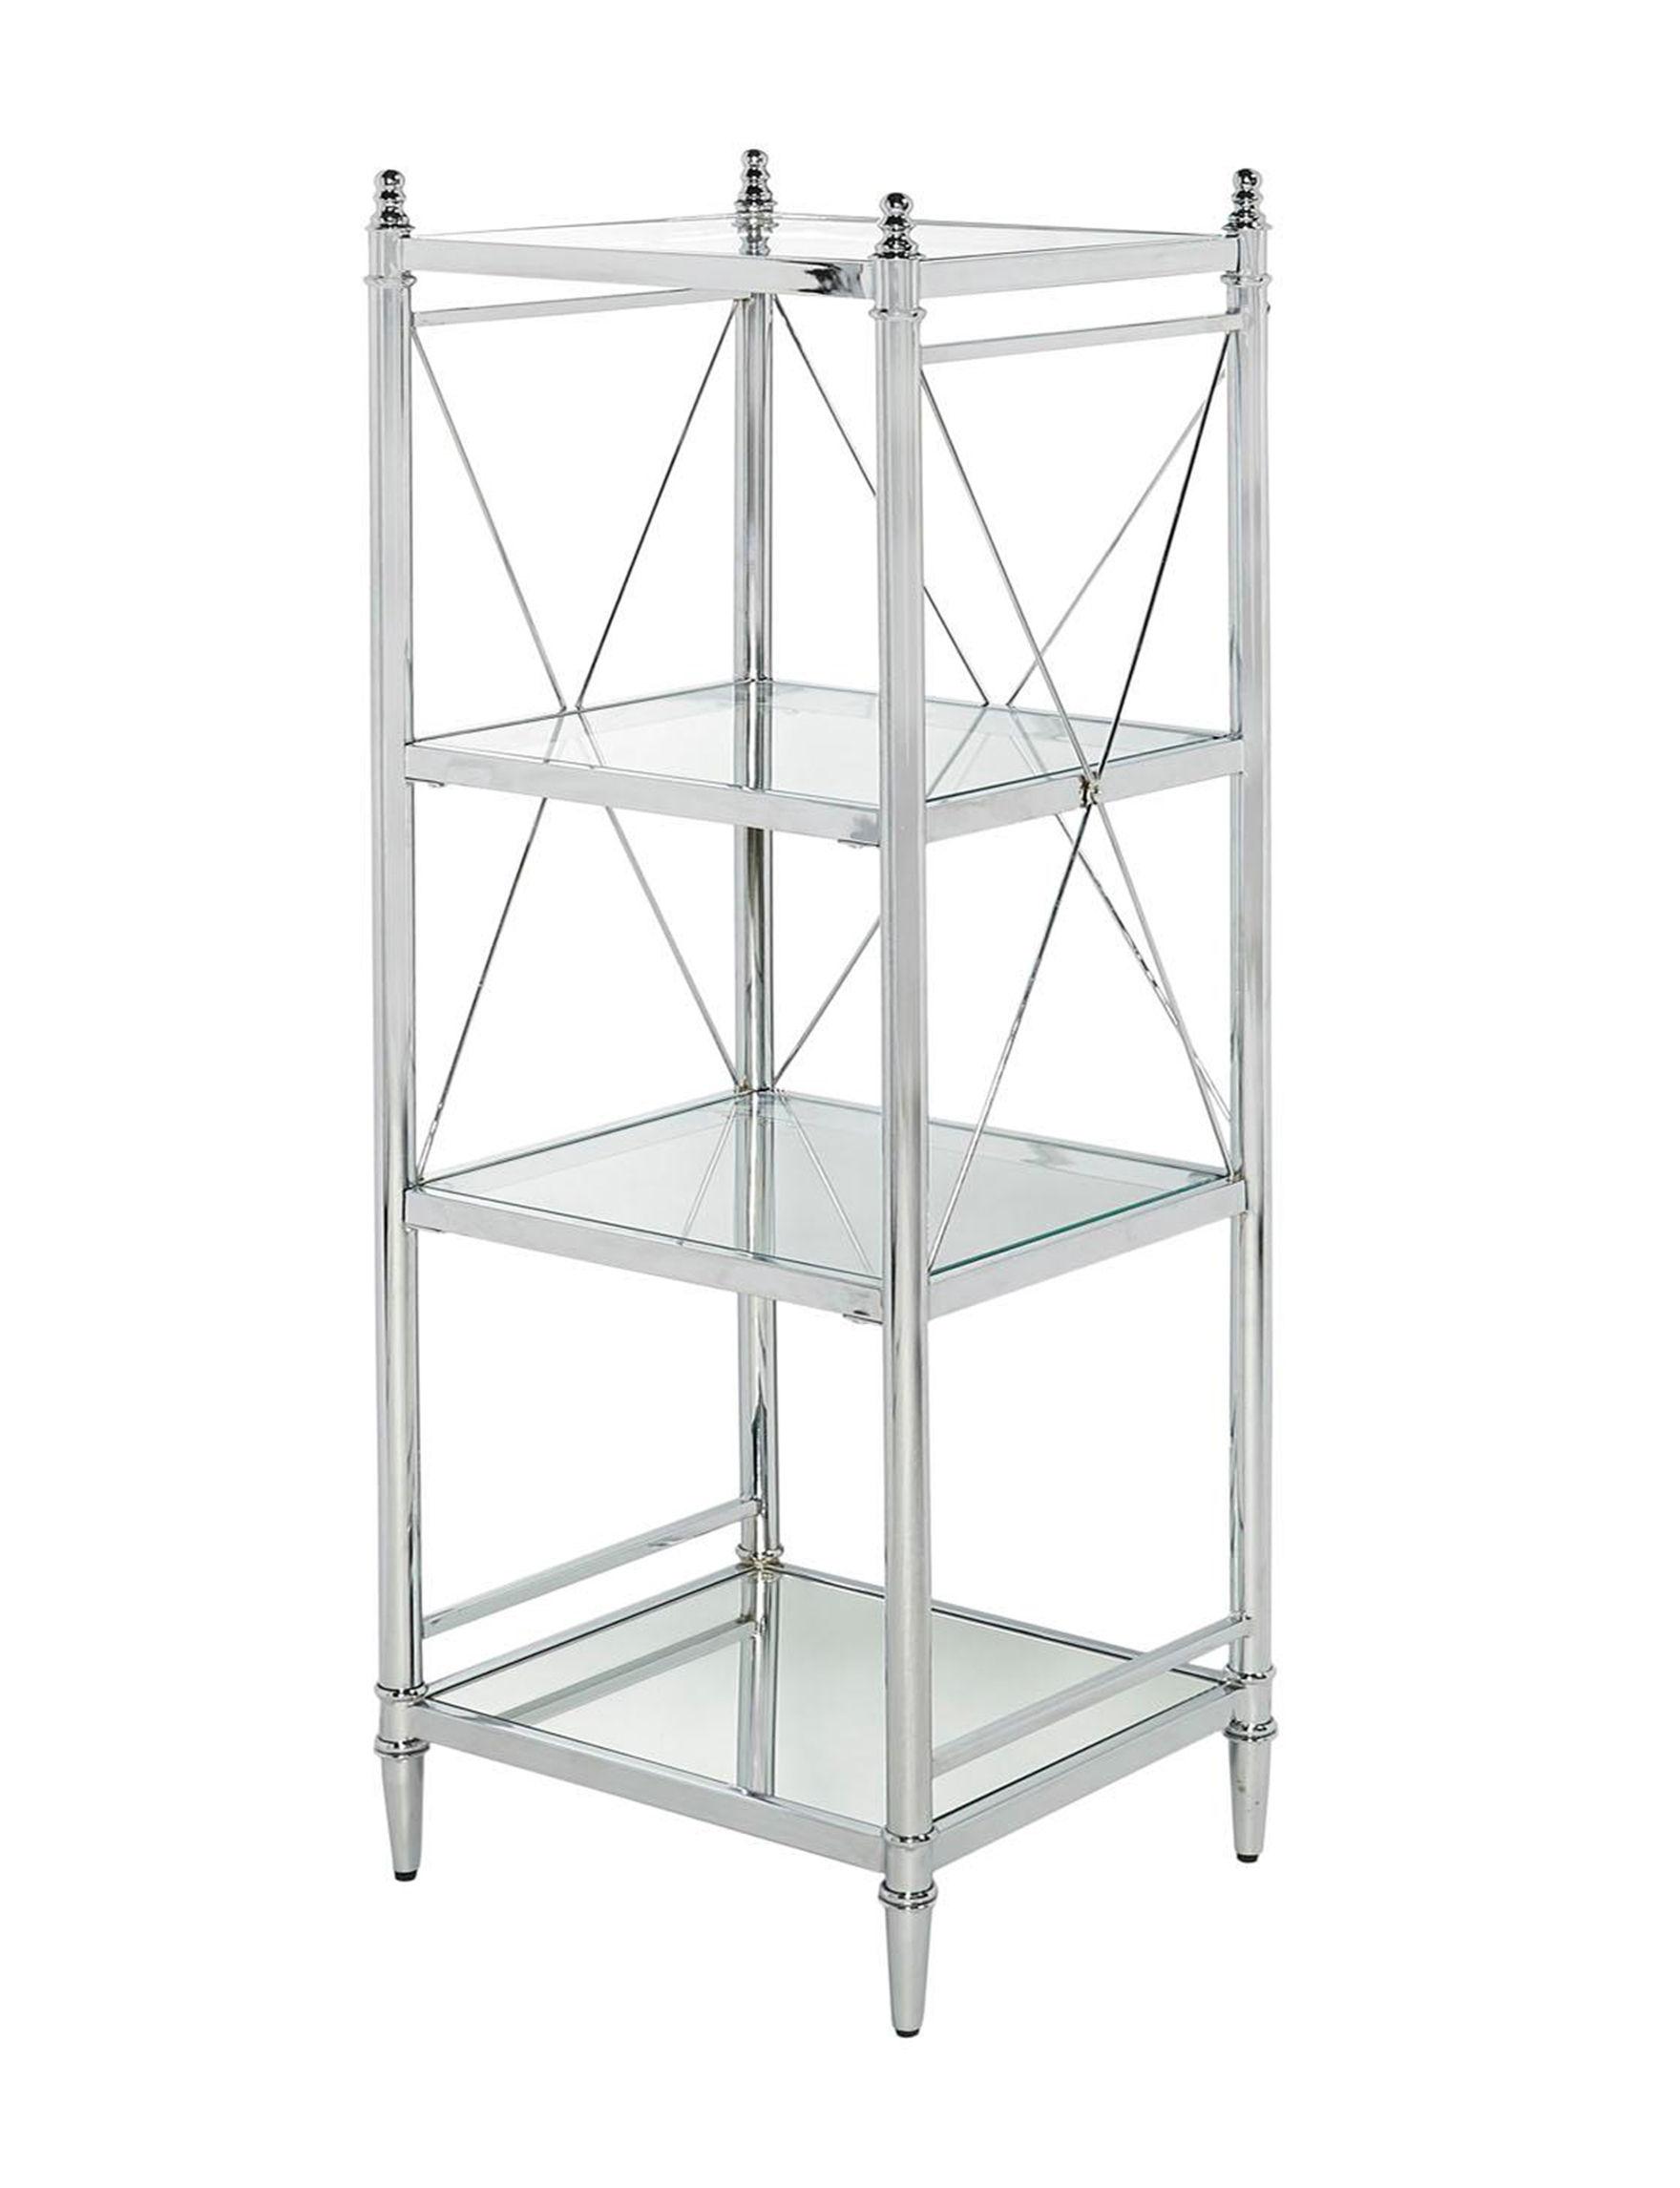 Linon Chrome Storage Shelves Bathroom Furniture